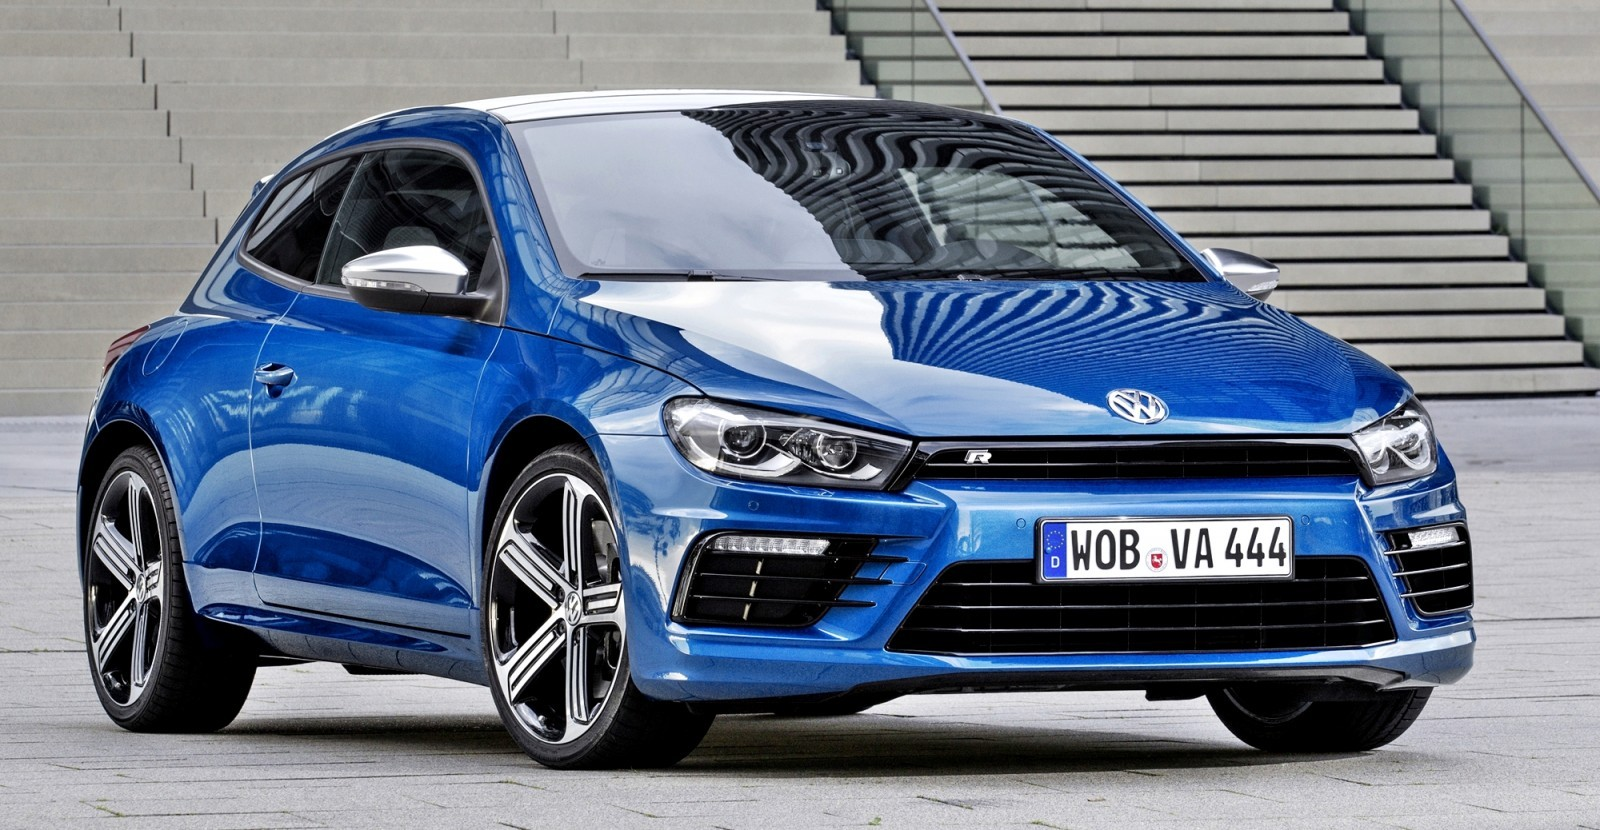 Der neue Volkswagen Scirocco R